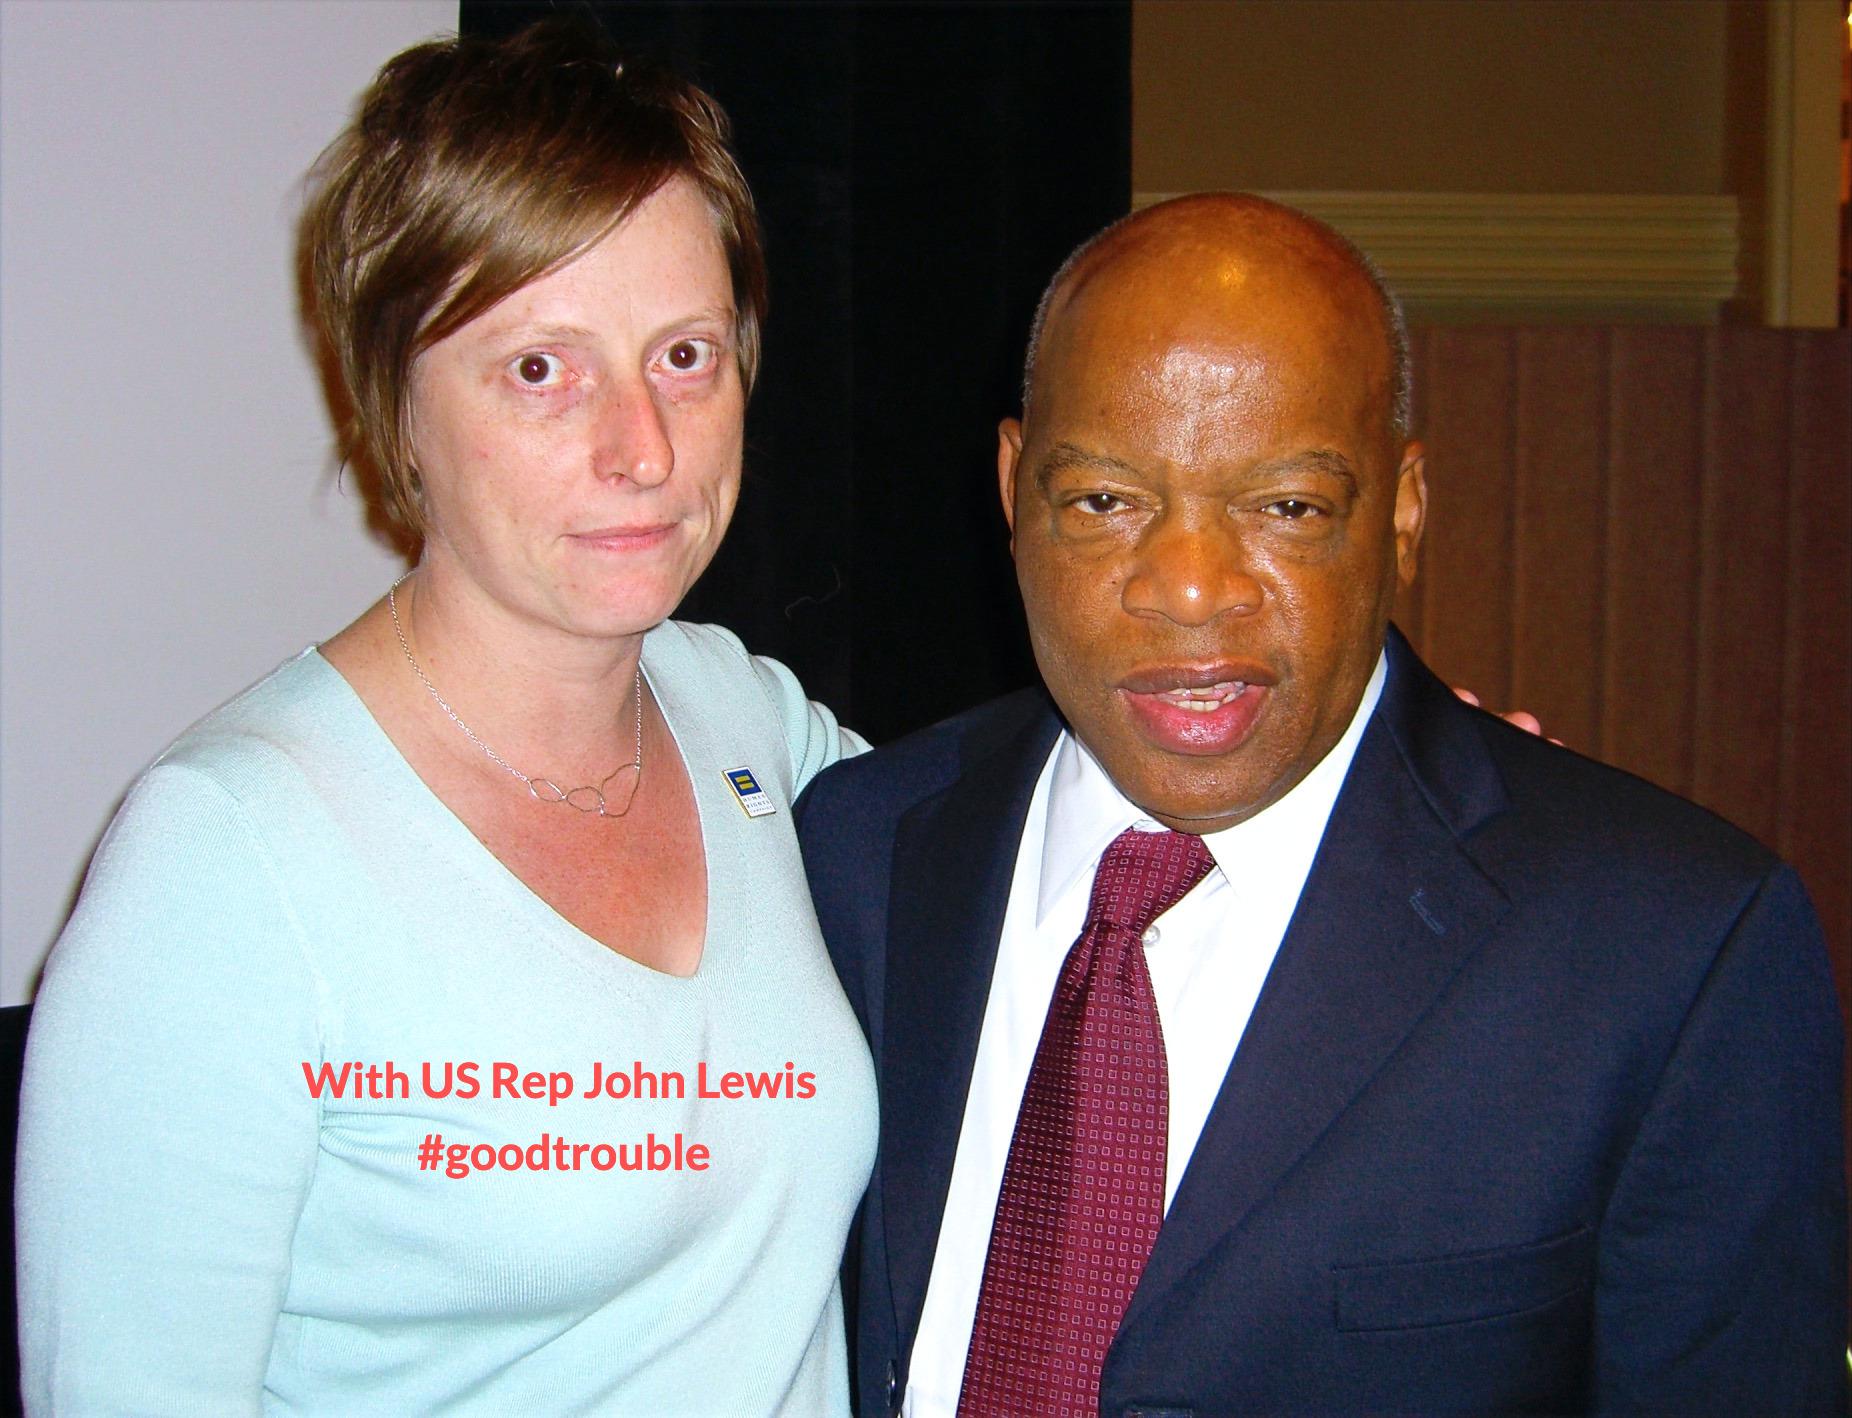 with U.S. Rep John Lewis